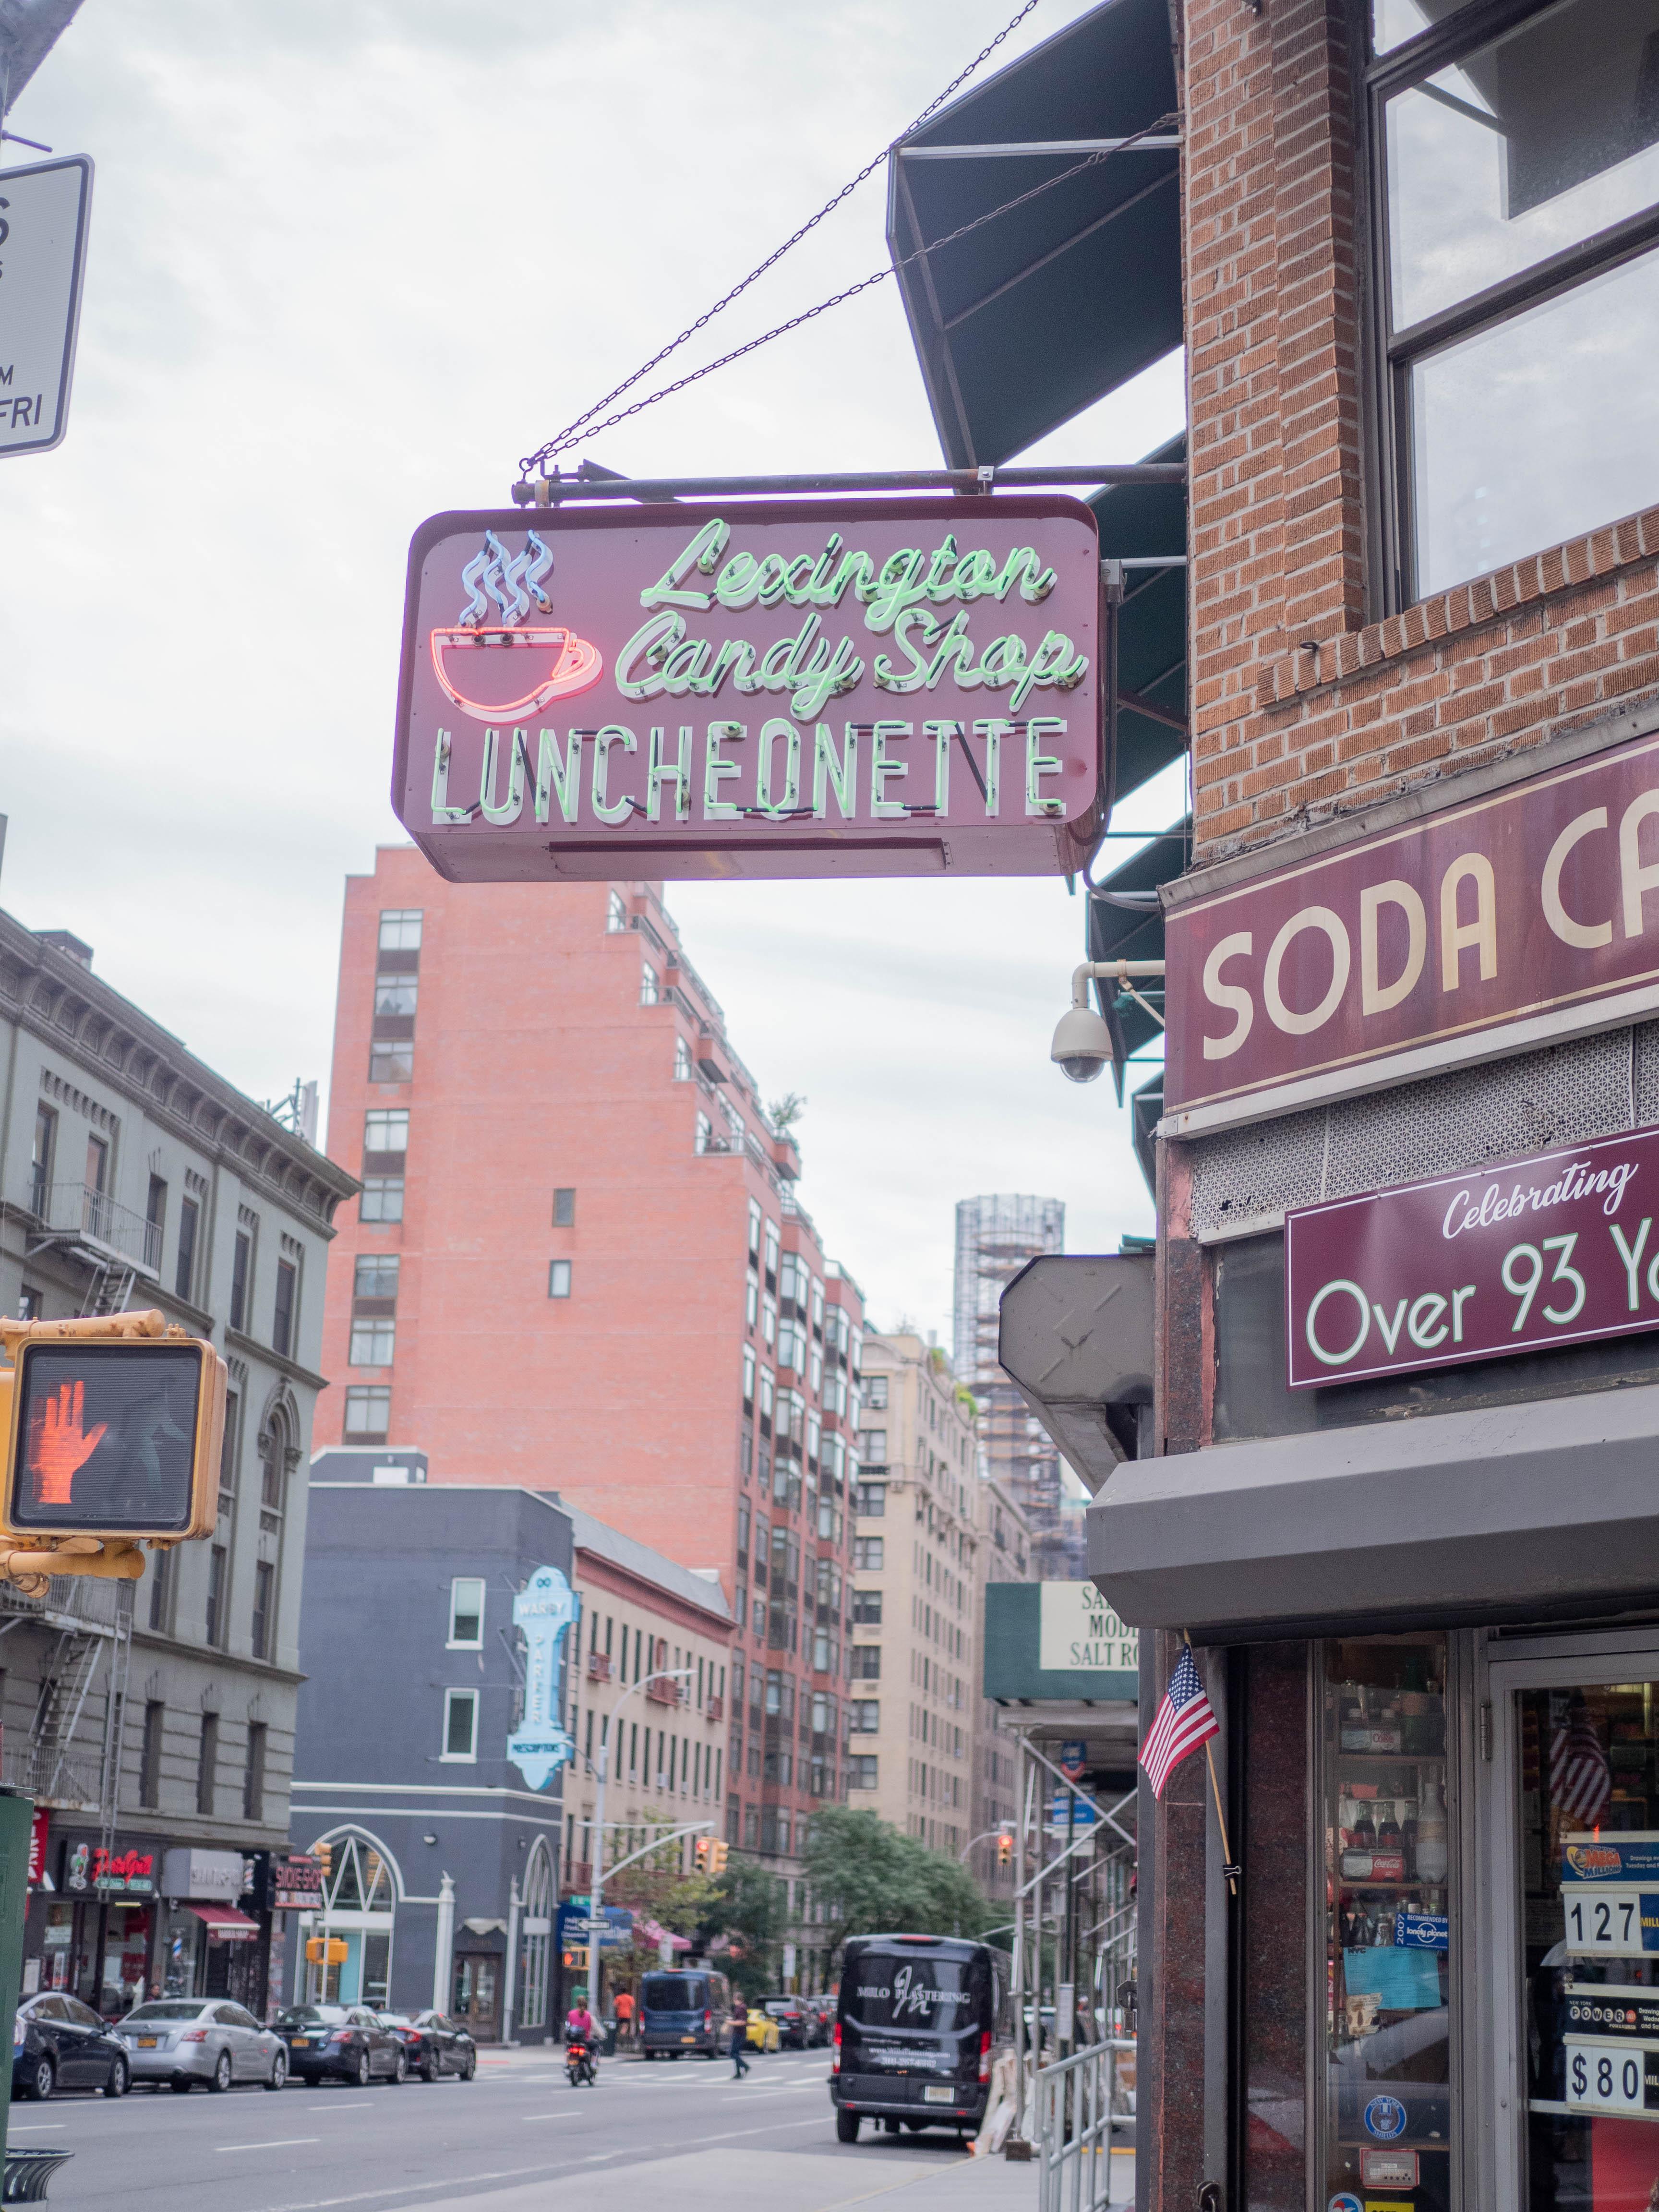 Lexington Candy Shop, a classic NYC diner